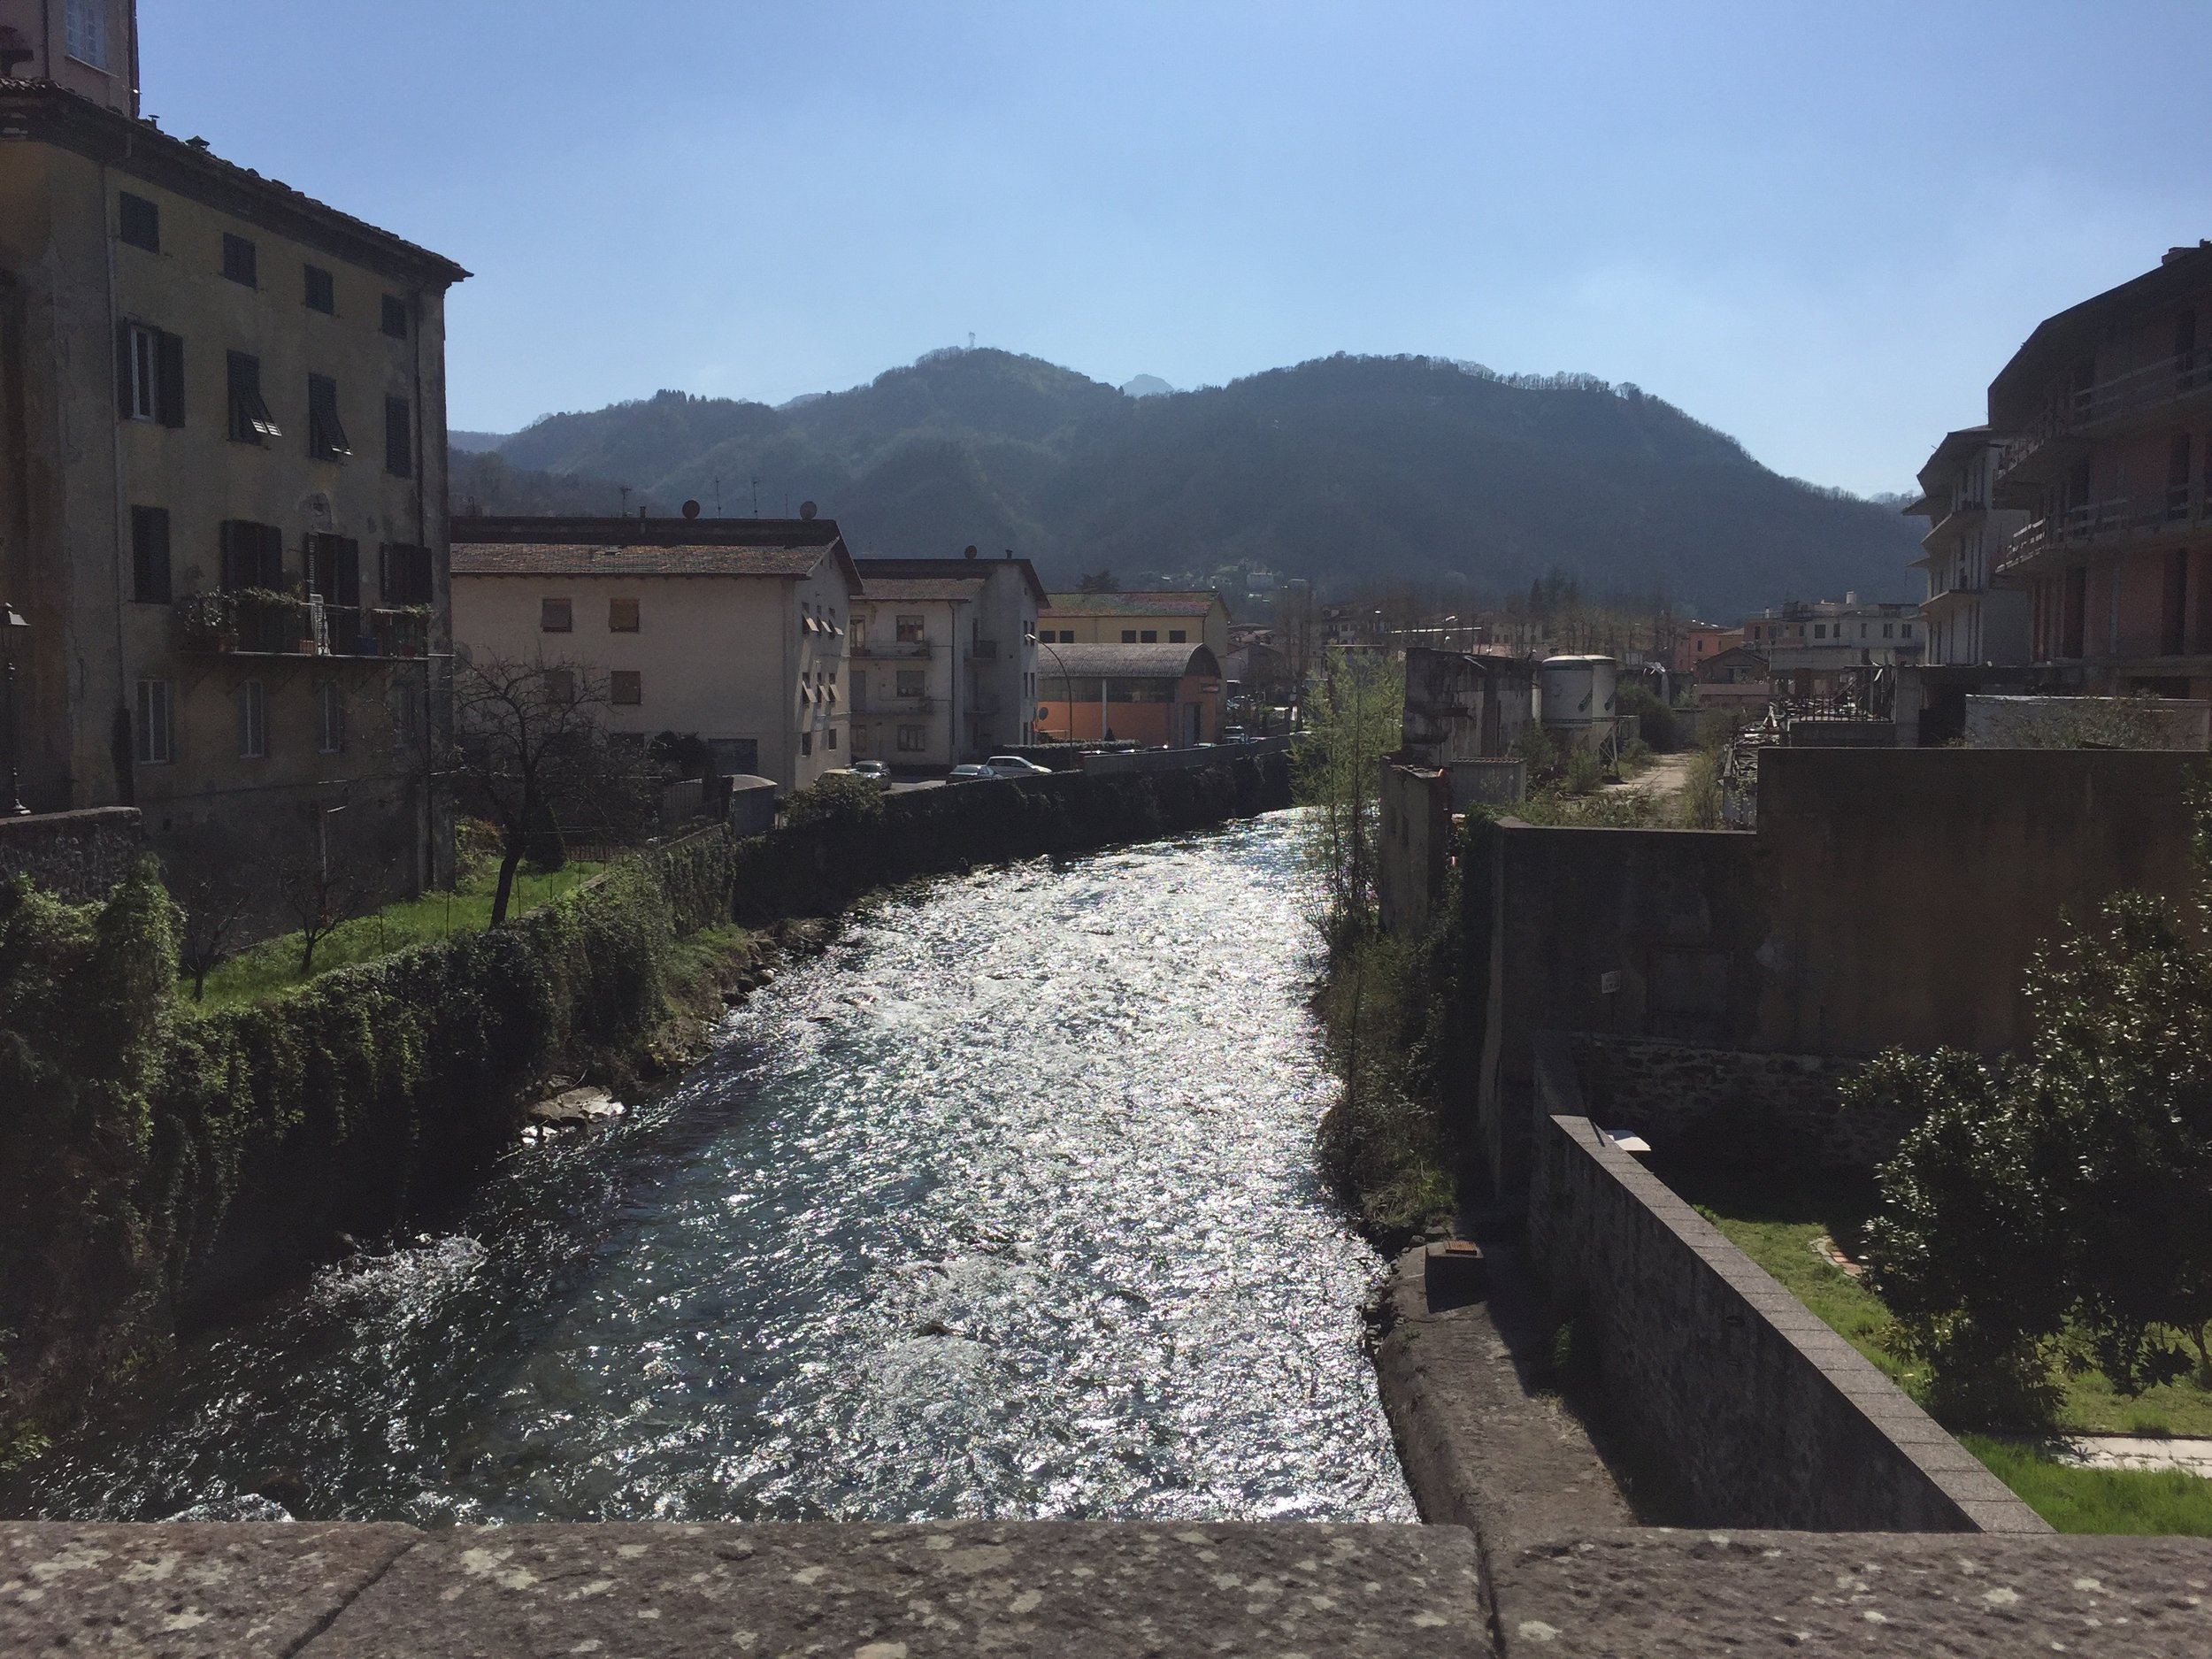 On a stroll through Castelnuovo di Garfagnana after lunch.